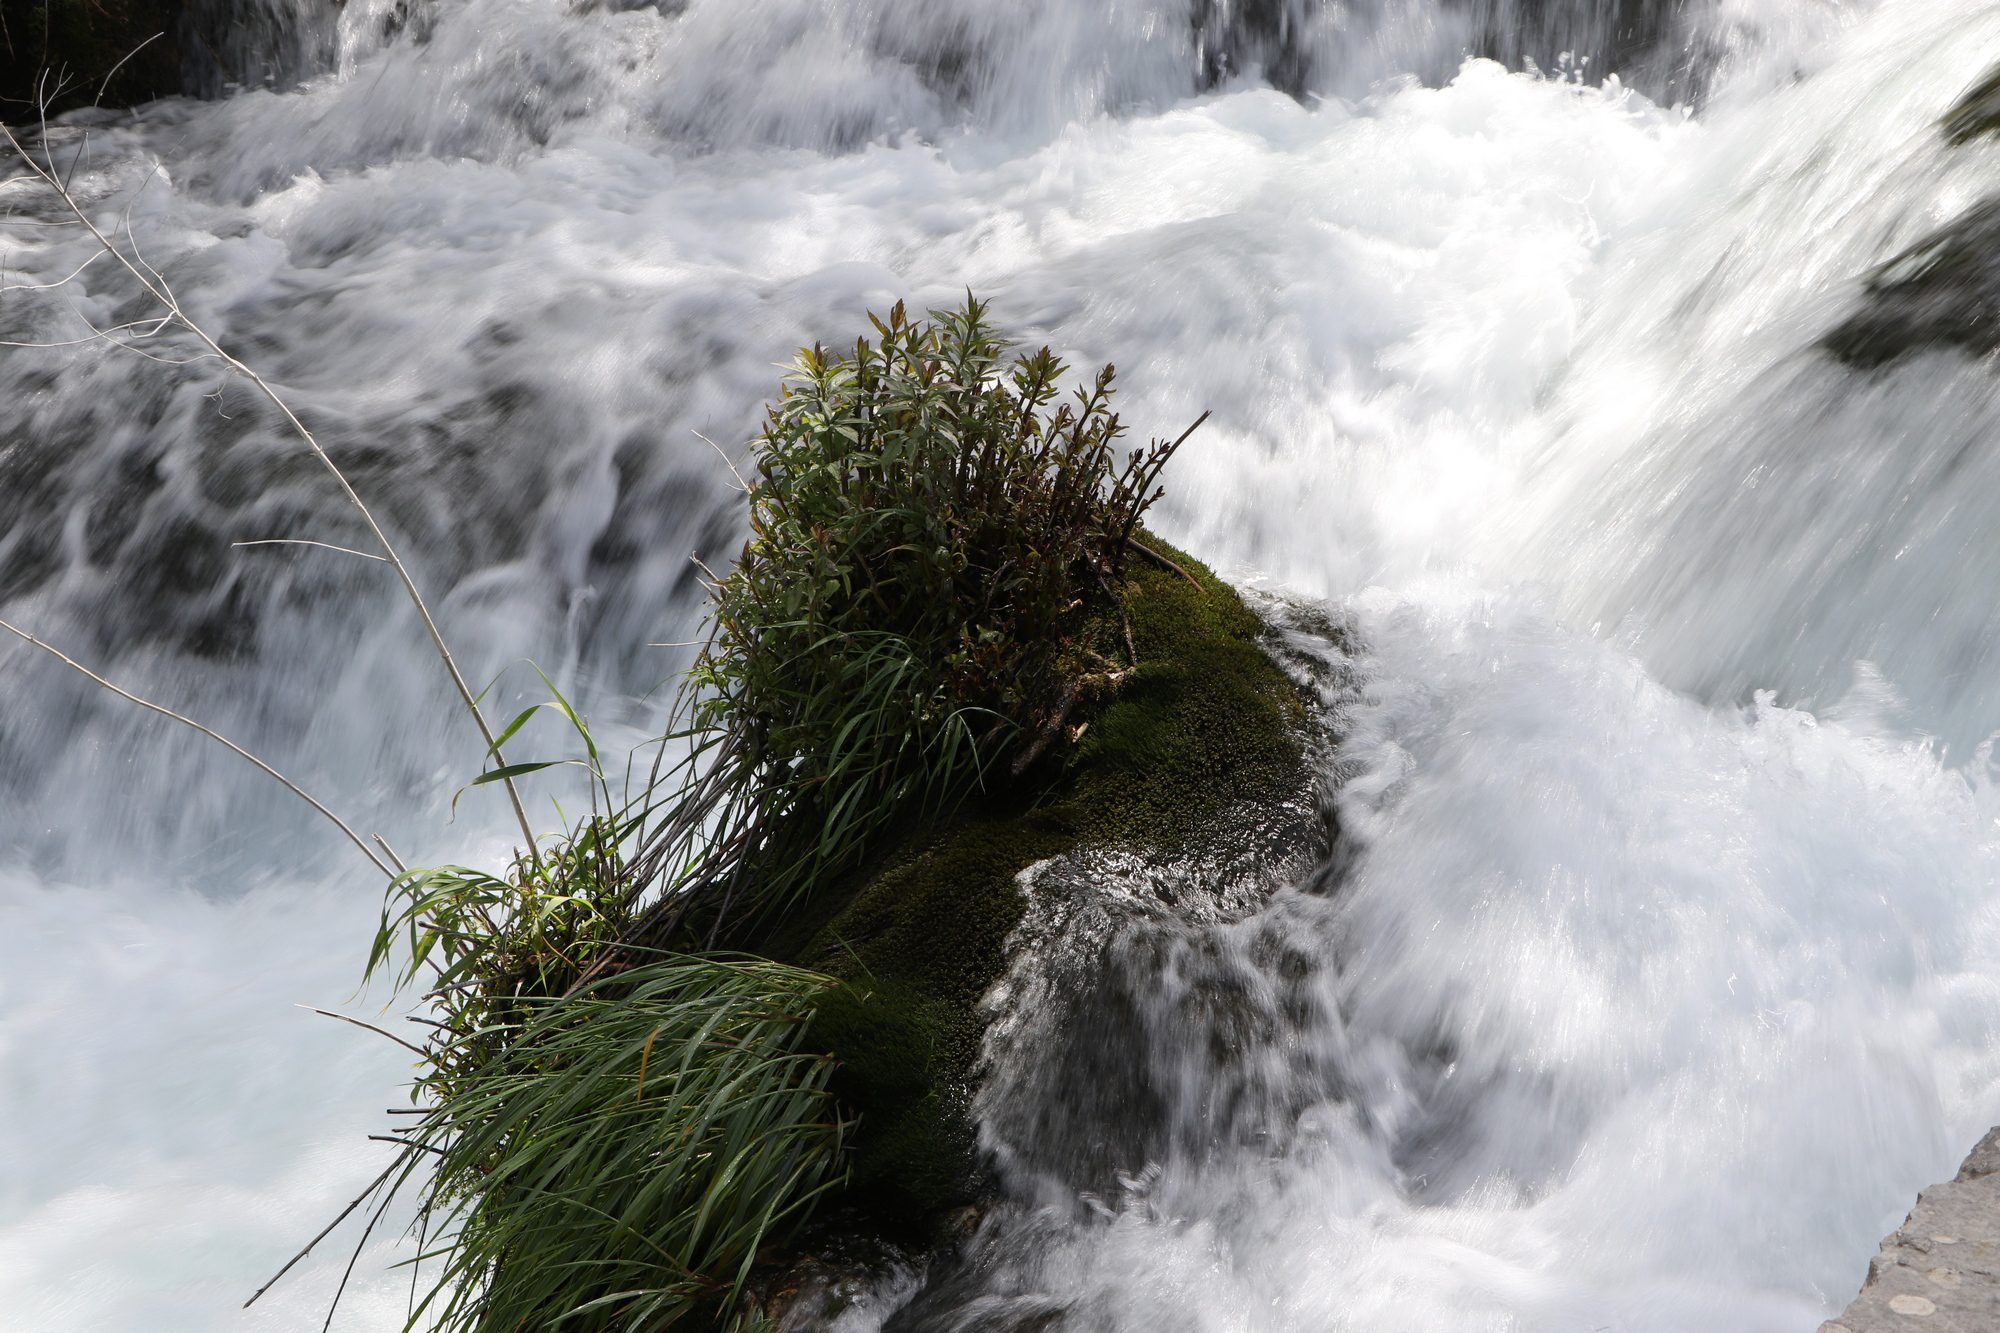 Wasserfall im Krka-Nationalpark